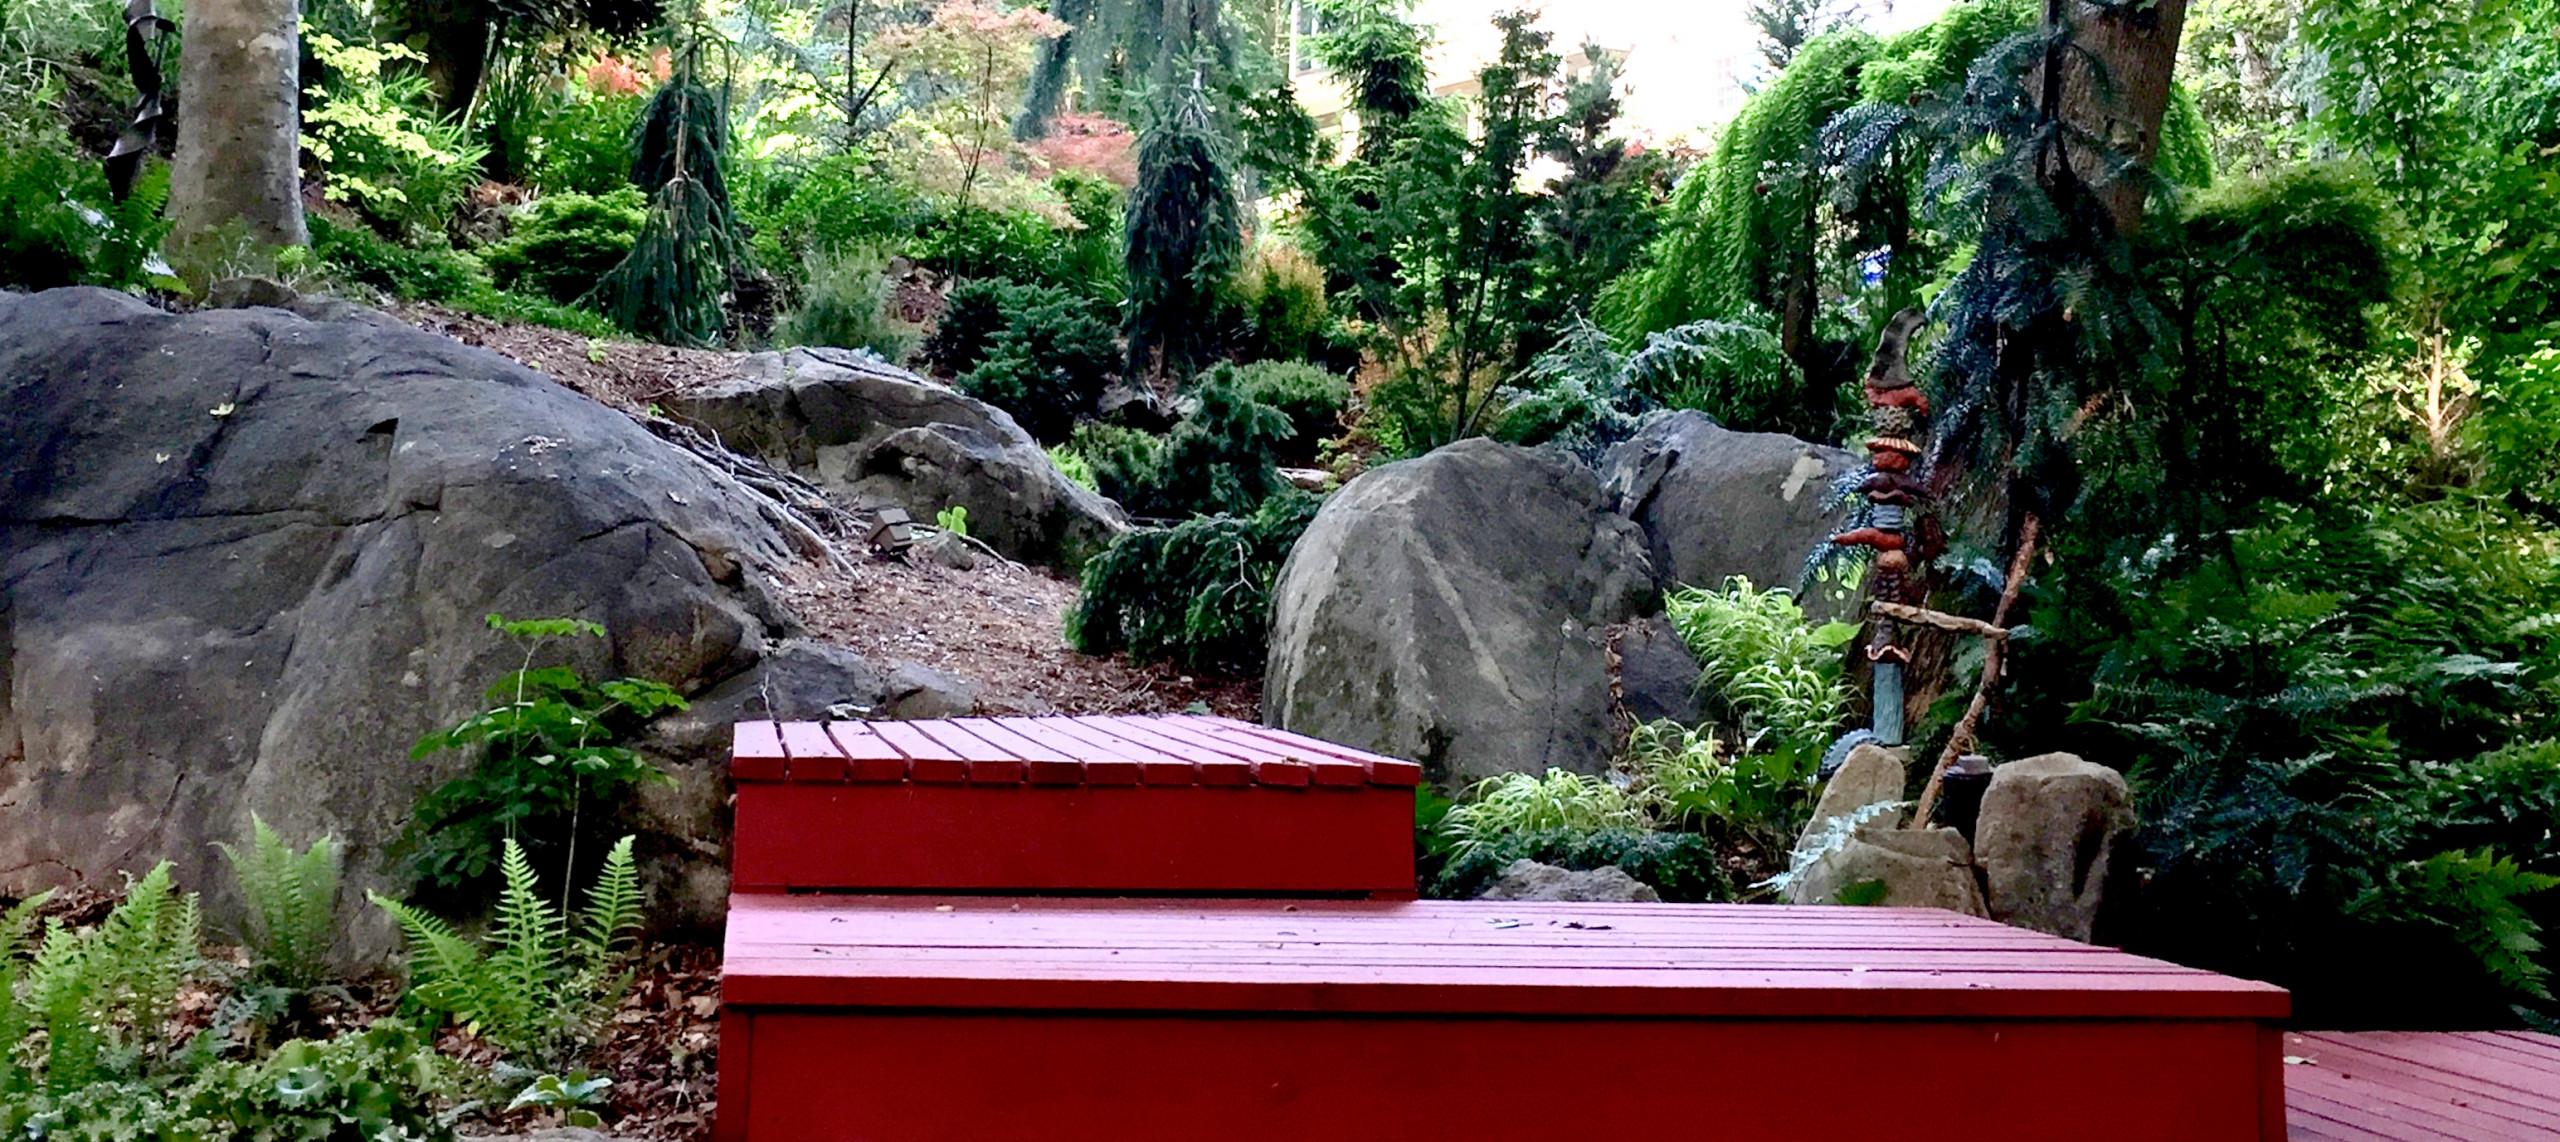 Conifer 'amphitheater'